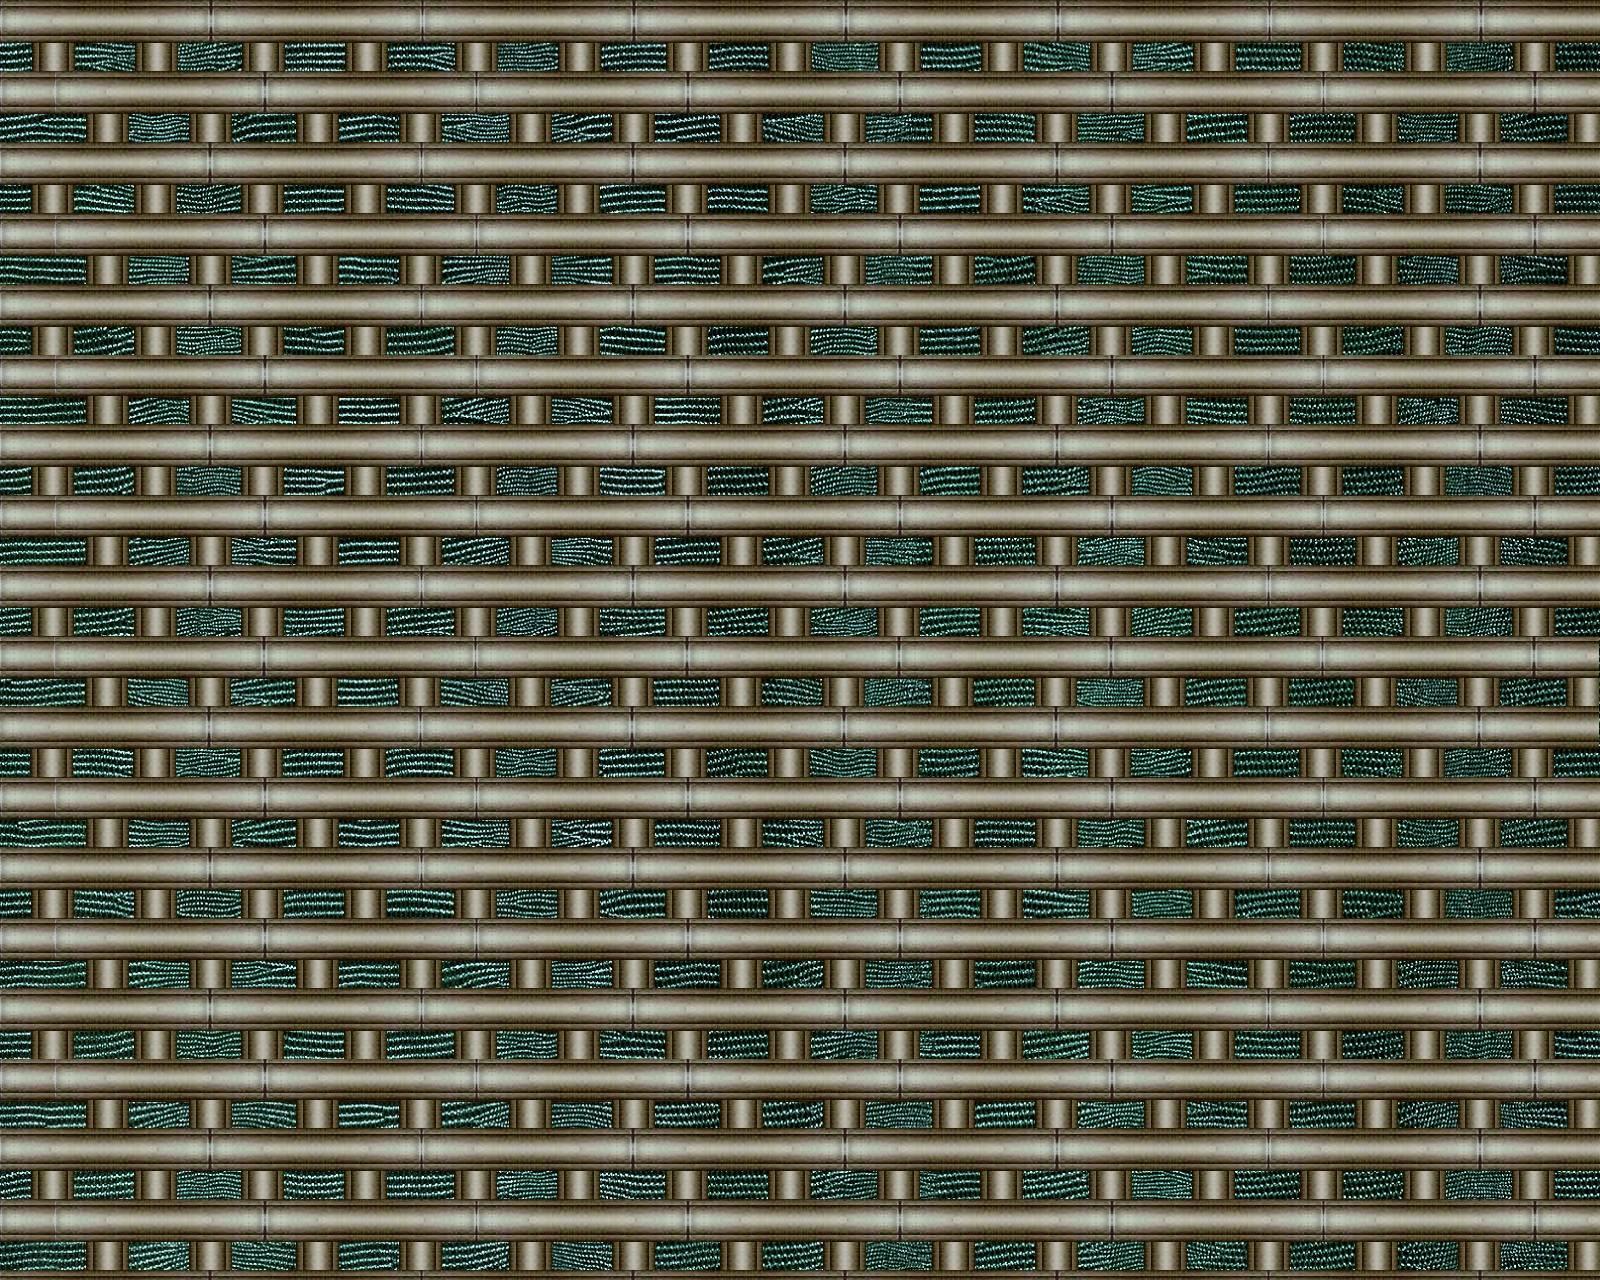 Brick Patterns 7